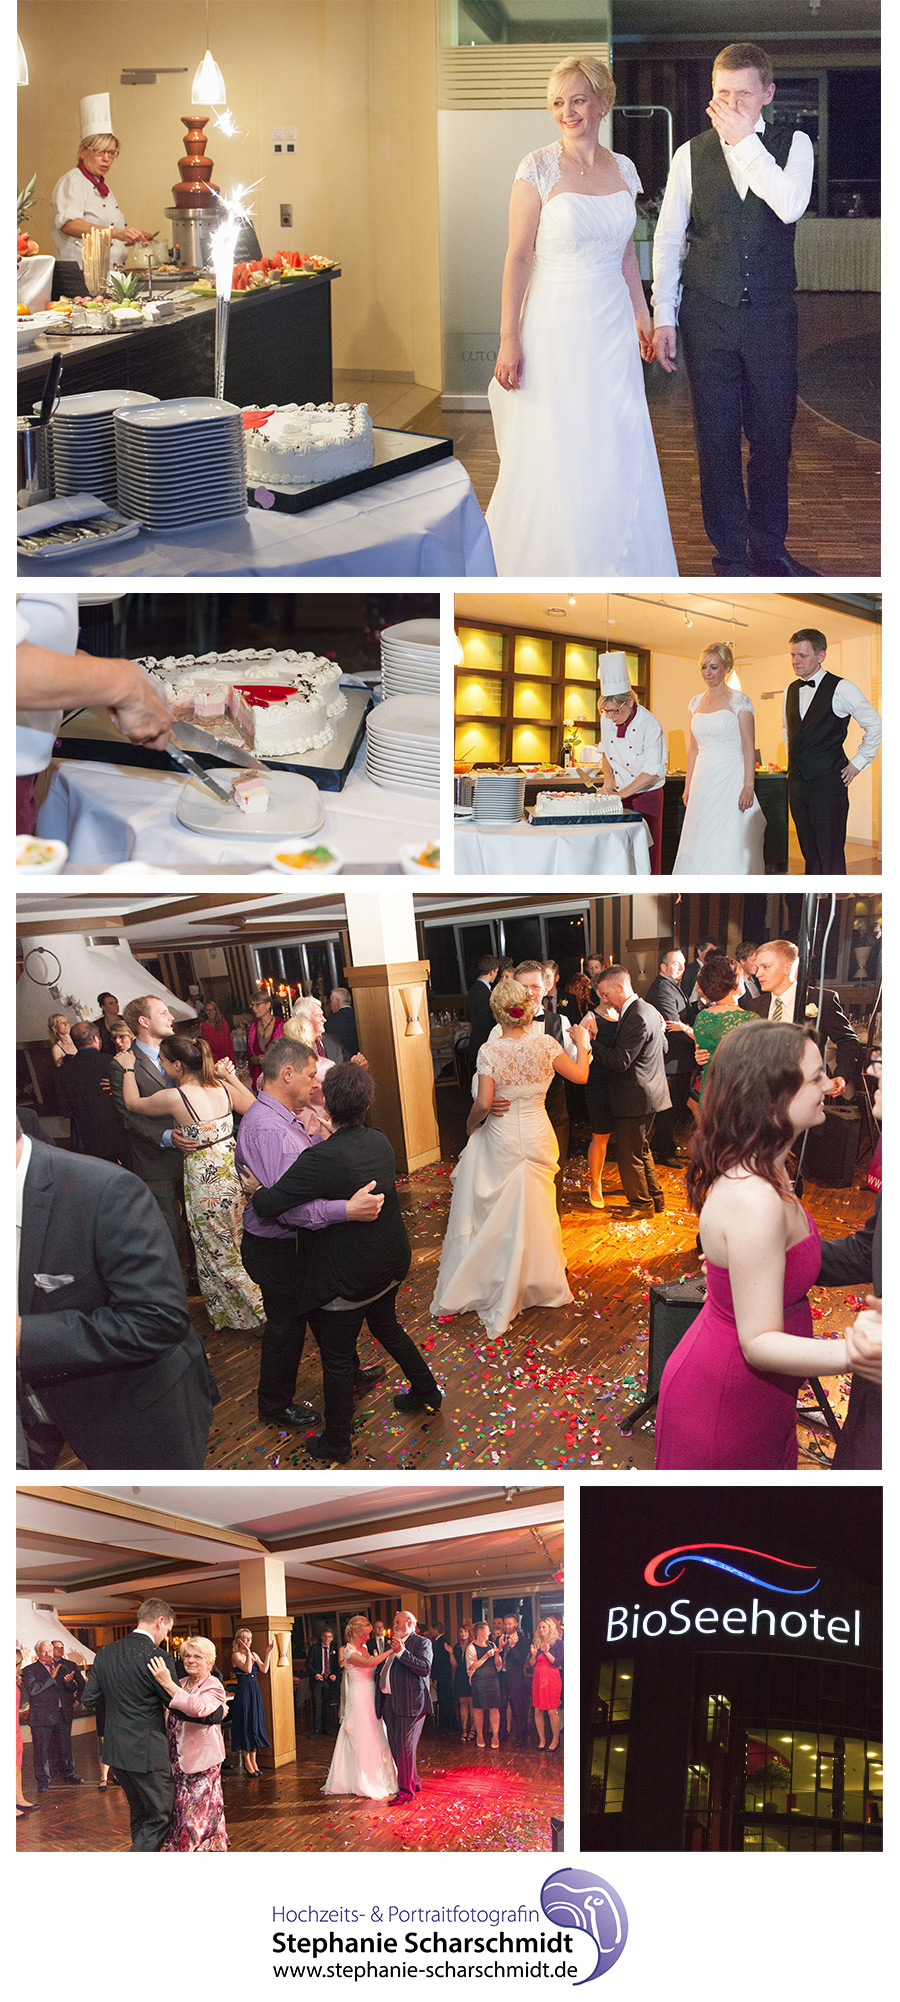 11. Hochzeitsfotos im Bio Seehotel Zeulenroda- Hochzeitsfotograf Bio-Seehotel Zeulenroda- Hochzeits- und Portraitfotografin Stephanie Scharschmidt - Hochzeitsfotograf Bio-Seehotel Zeulenroda –